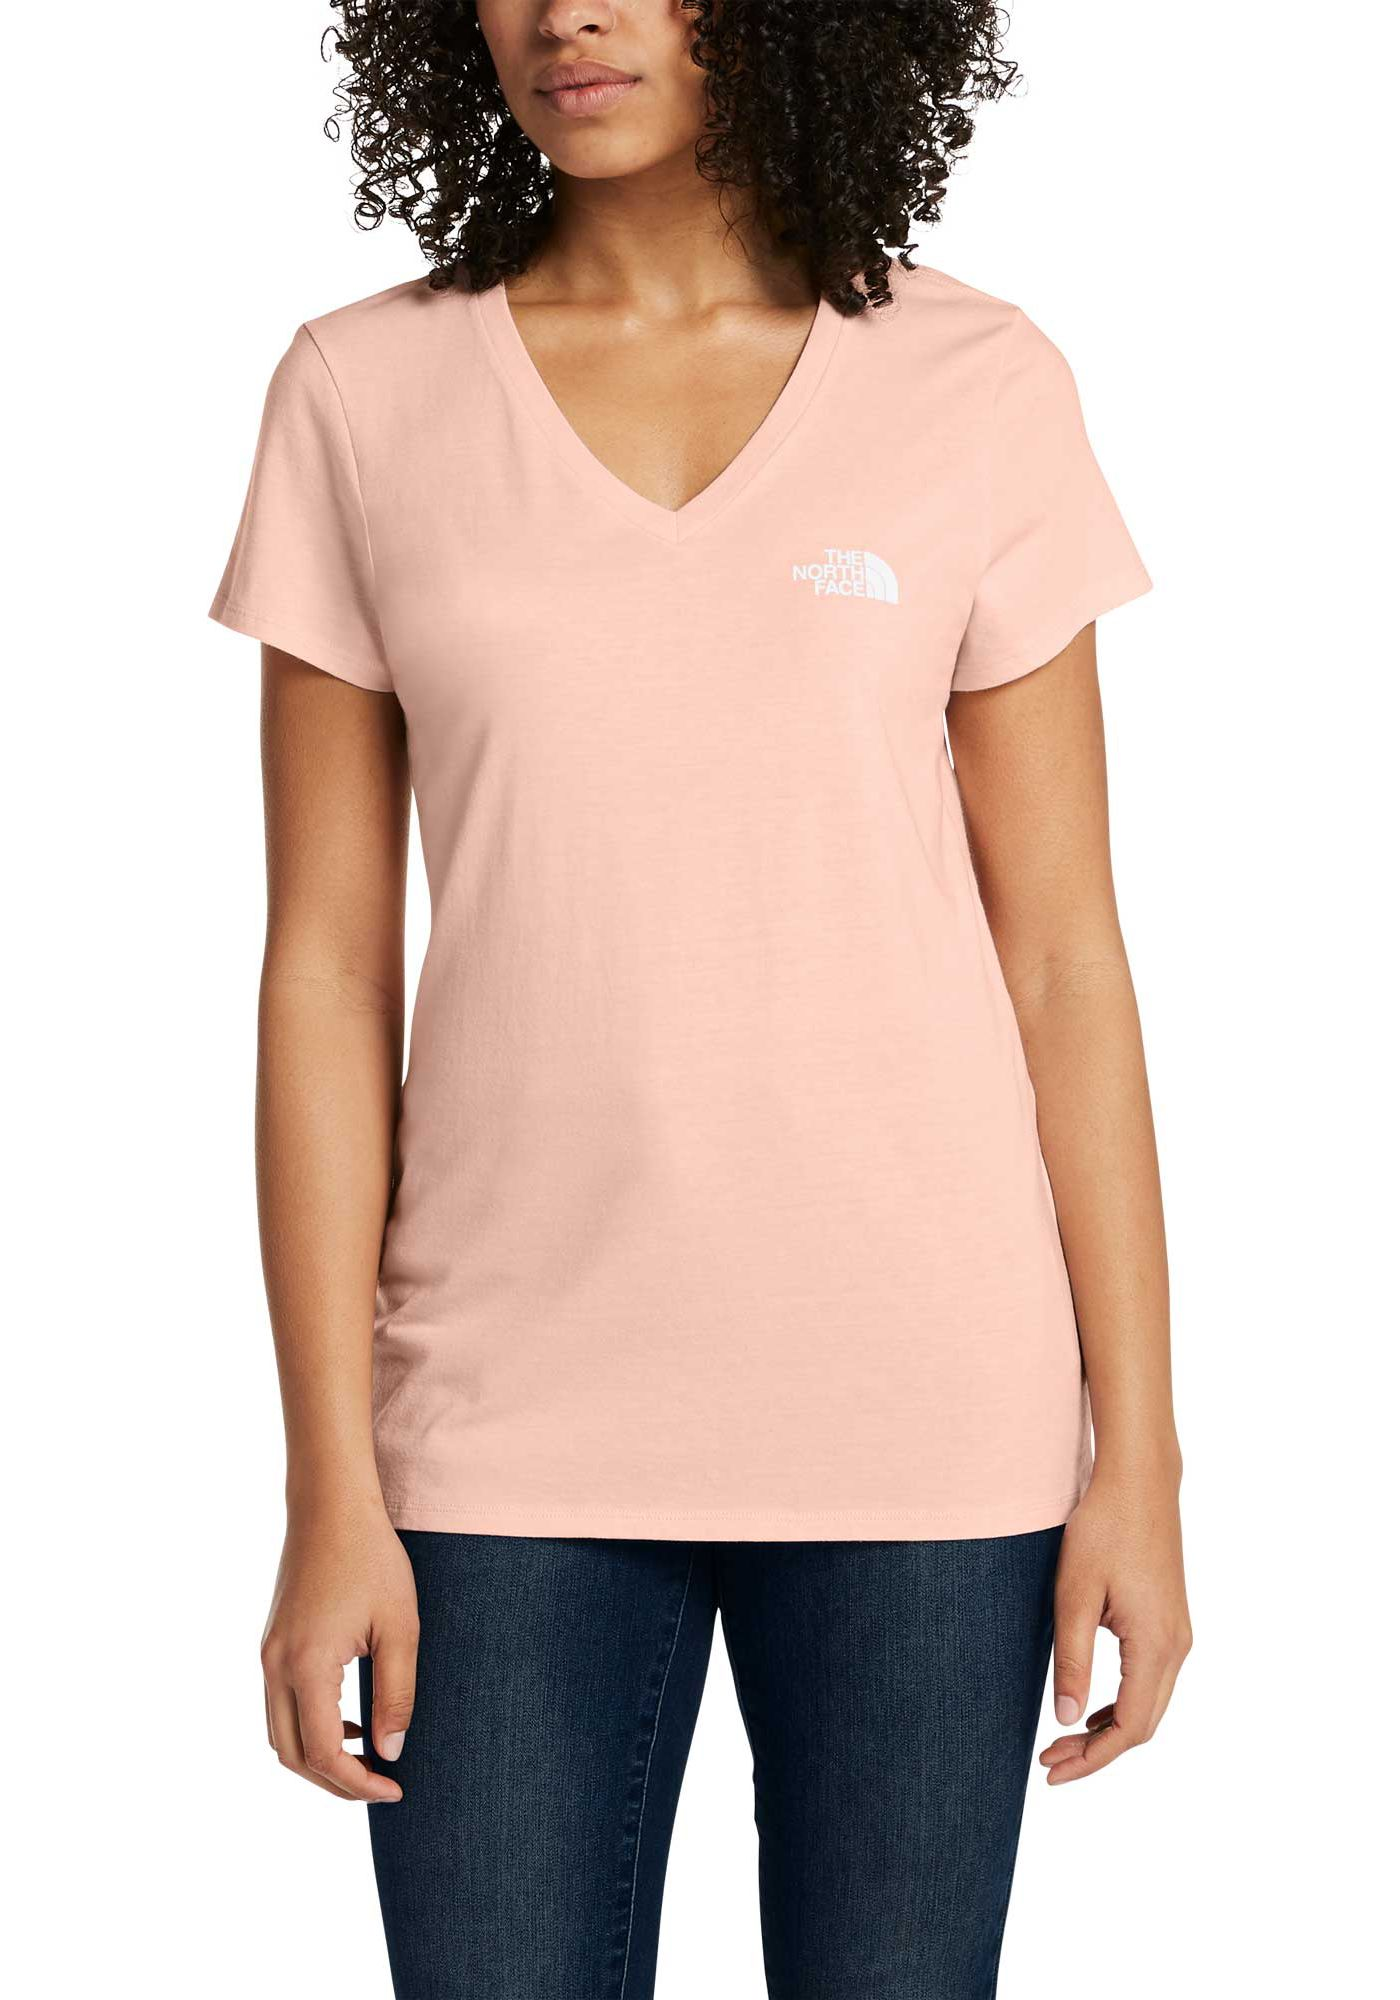 The North Face Women's Short Sleeve Brand Proud Tri-Blend V-Neck Shirt